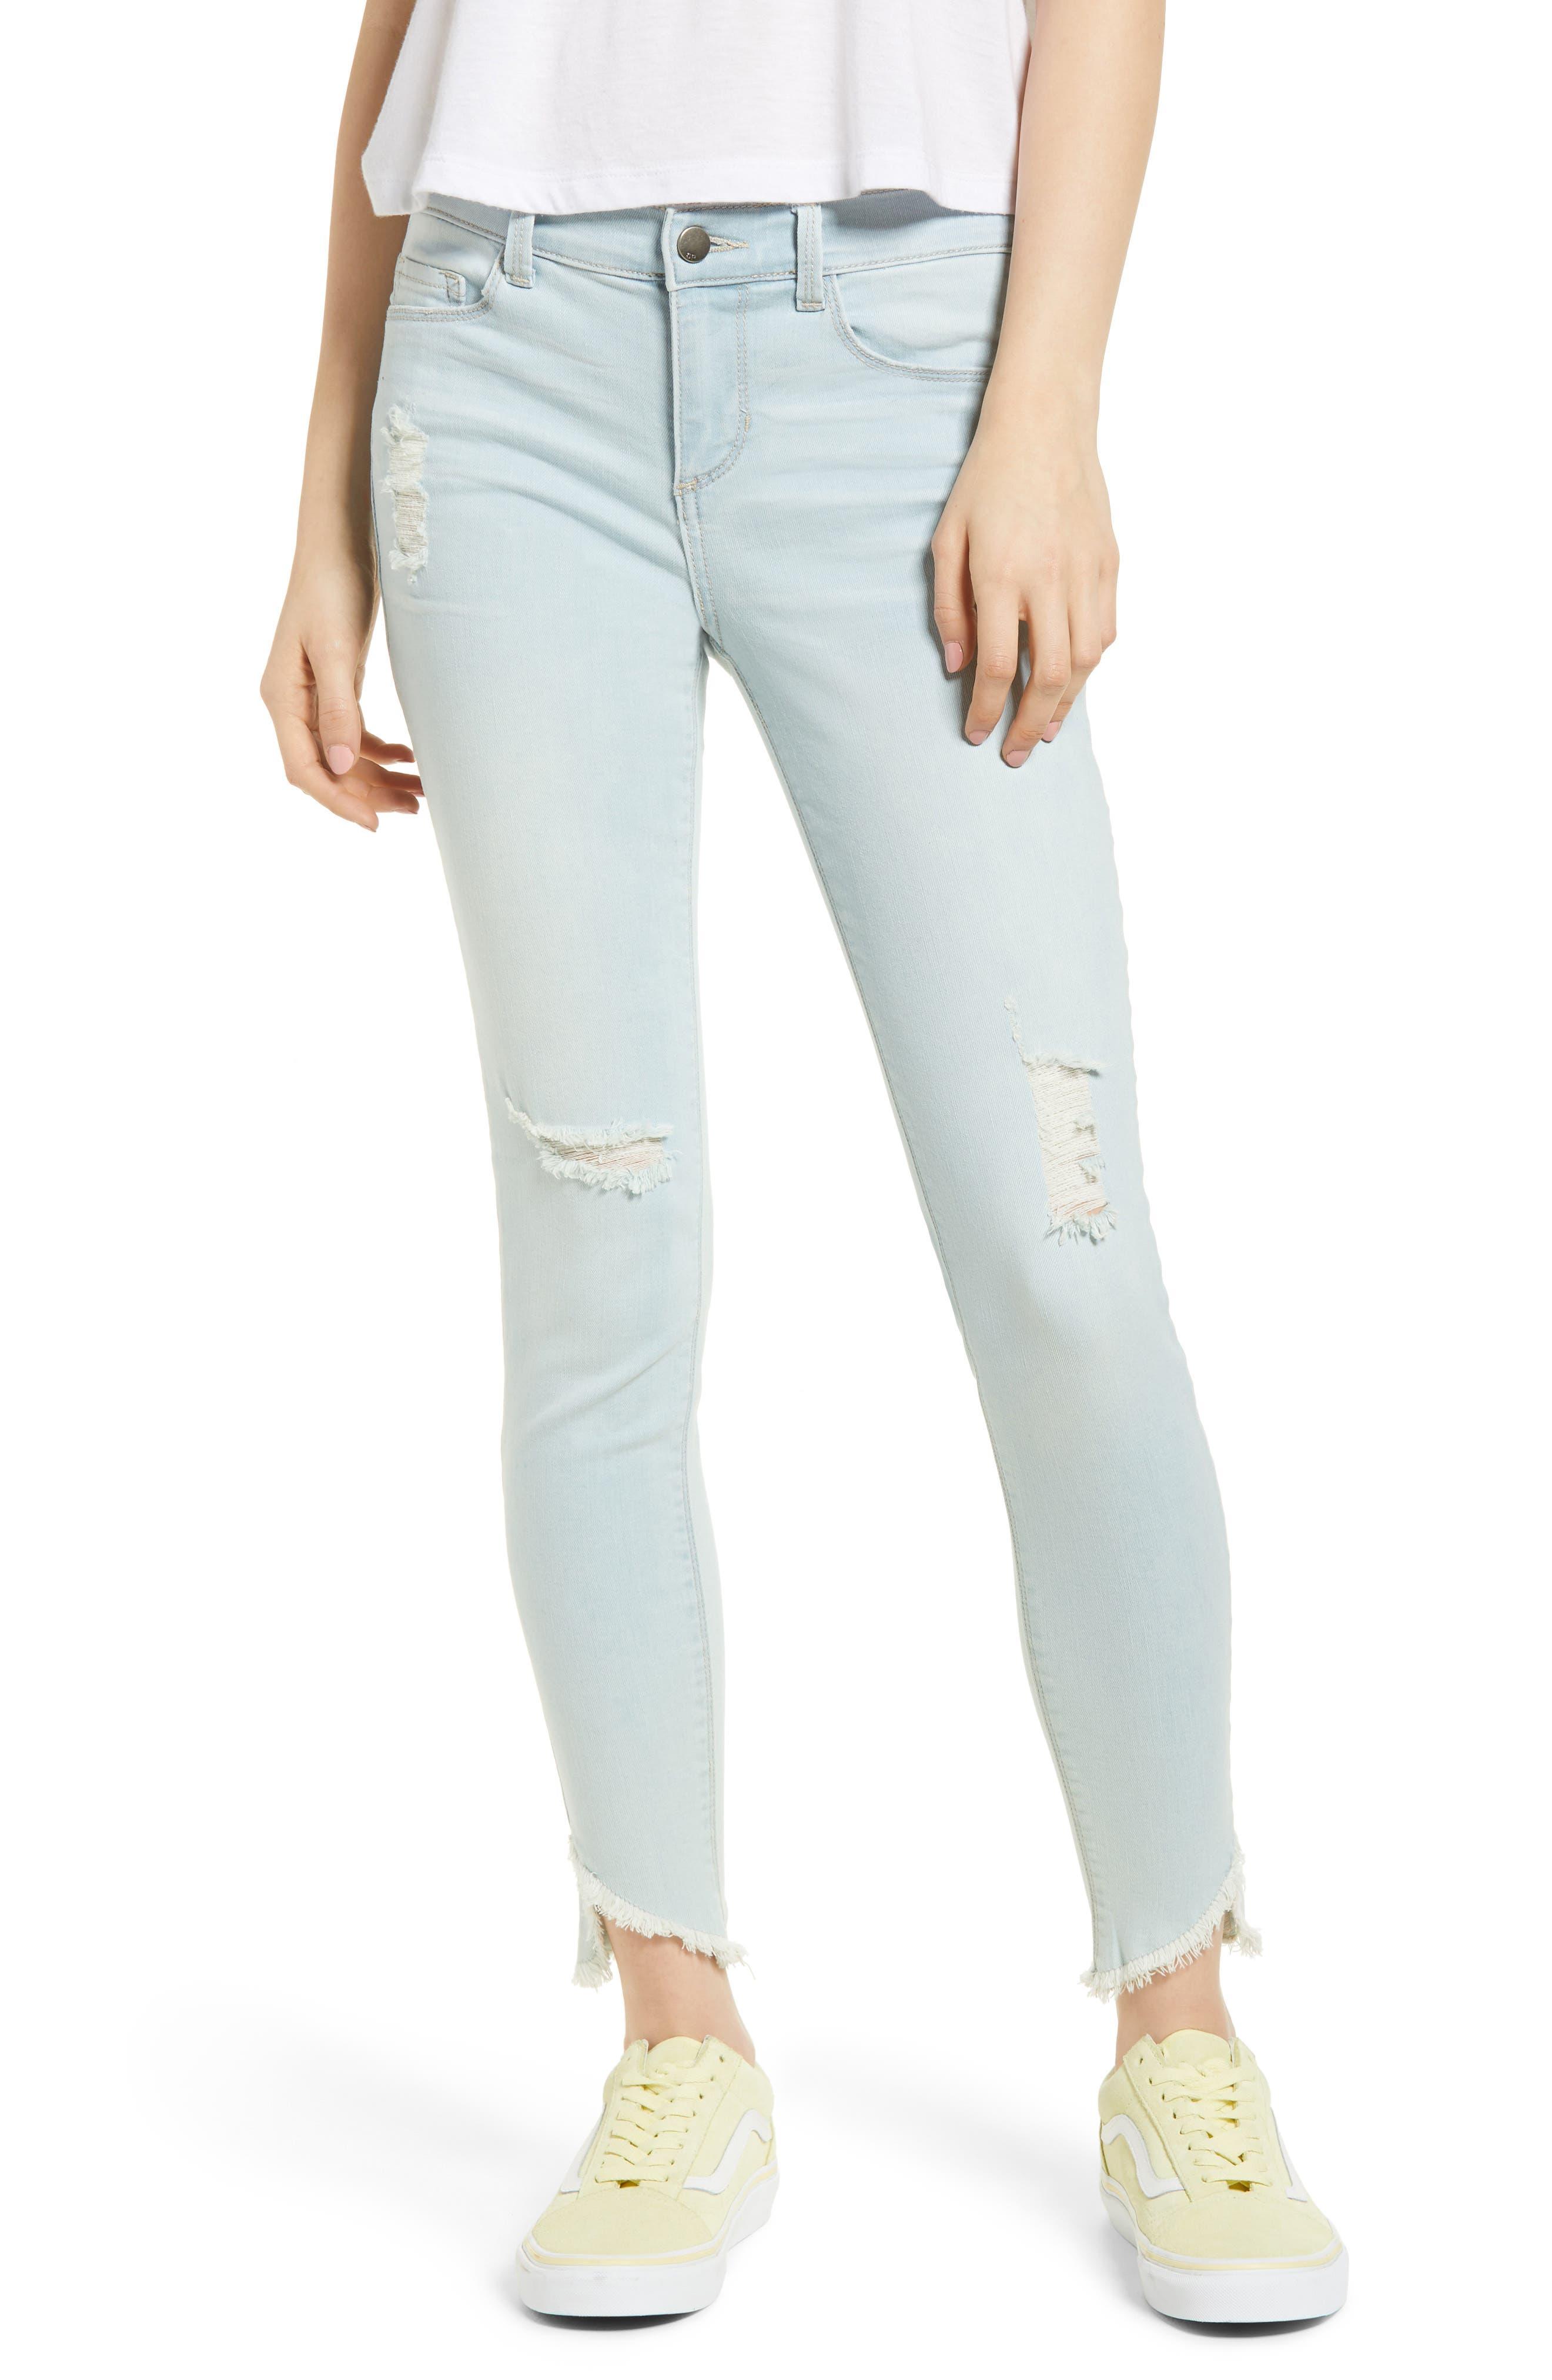 SP Black Distressed Asymmetrical Hem Skinny Jeans